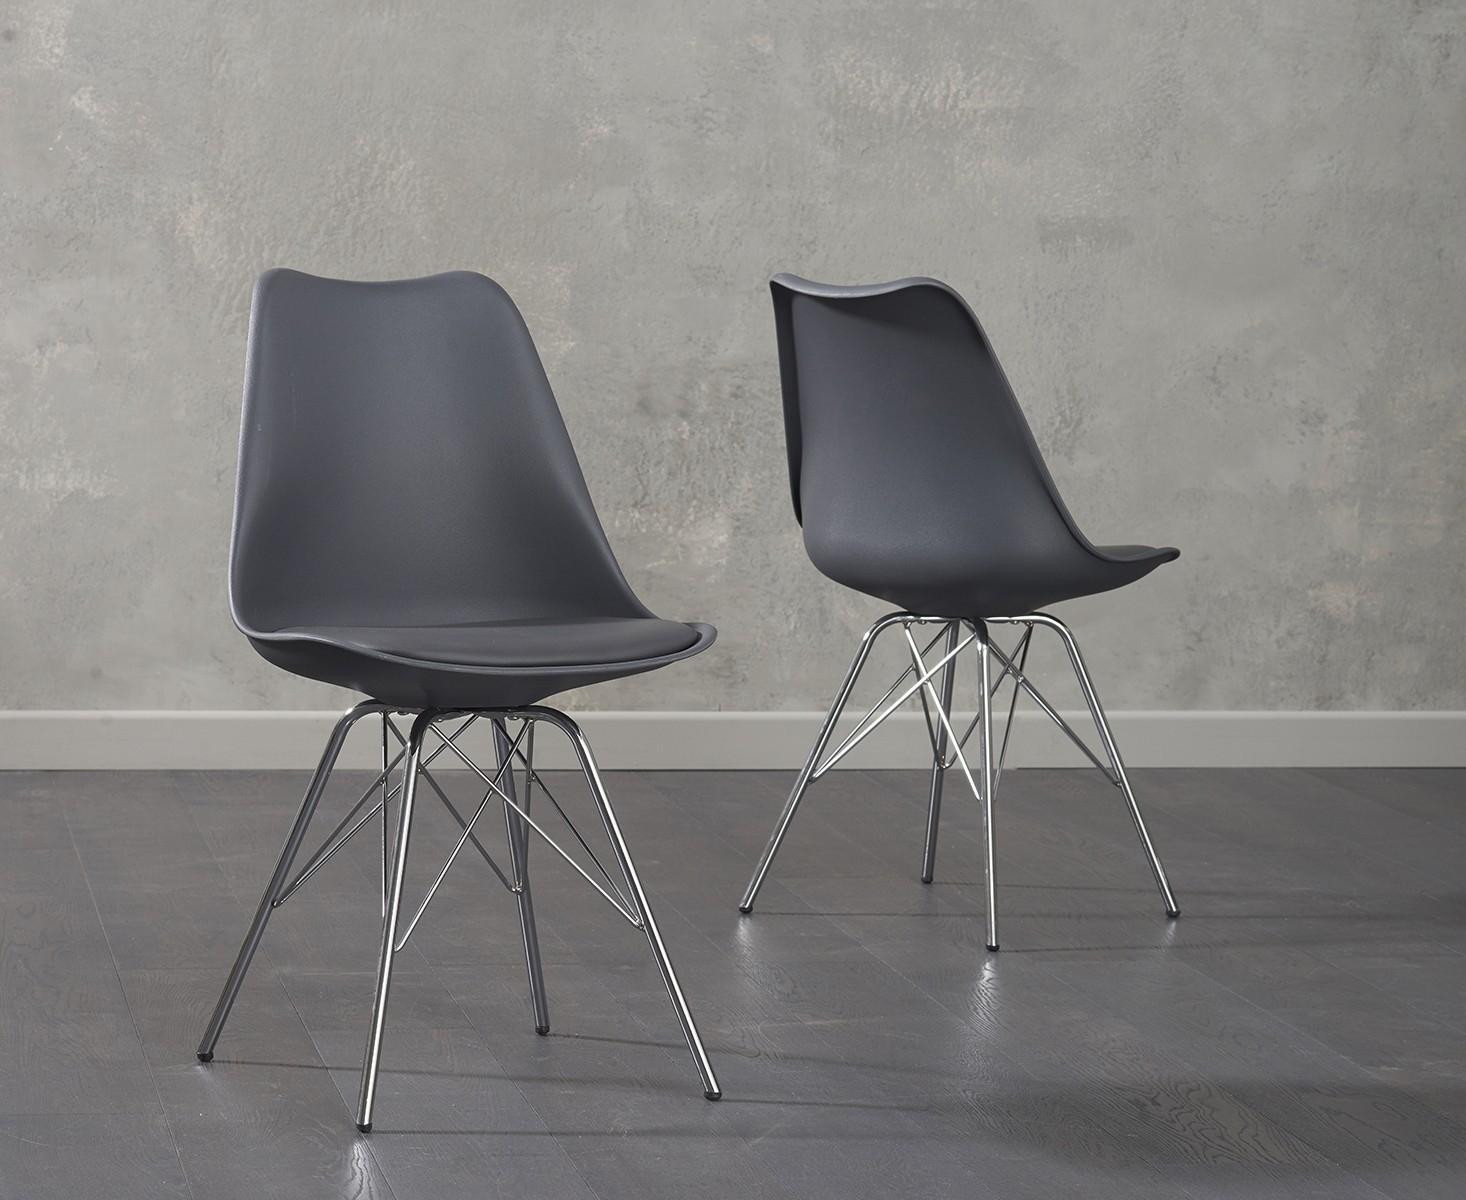 buy mark harris calabasus dark grey faux leather dining chair chrome legs pair online cfs uk. Black Bedroom Furniture Sets. Home Design Ideas